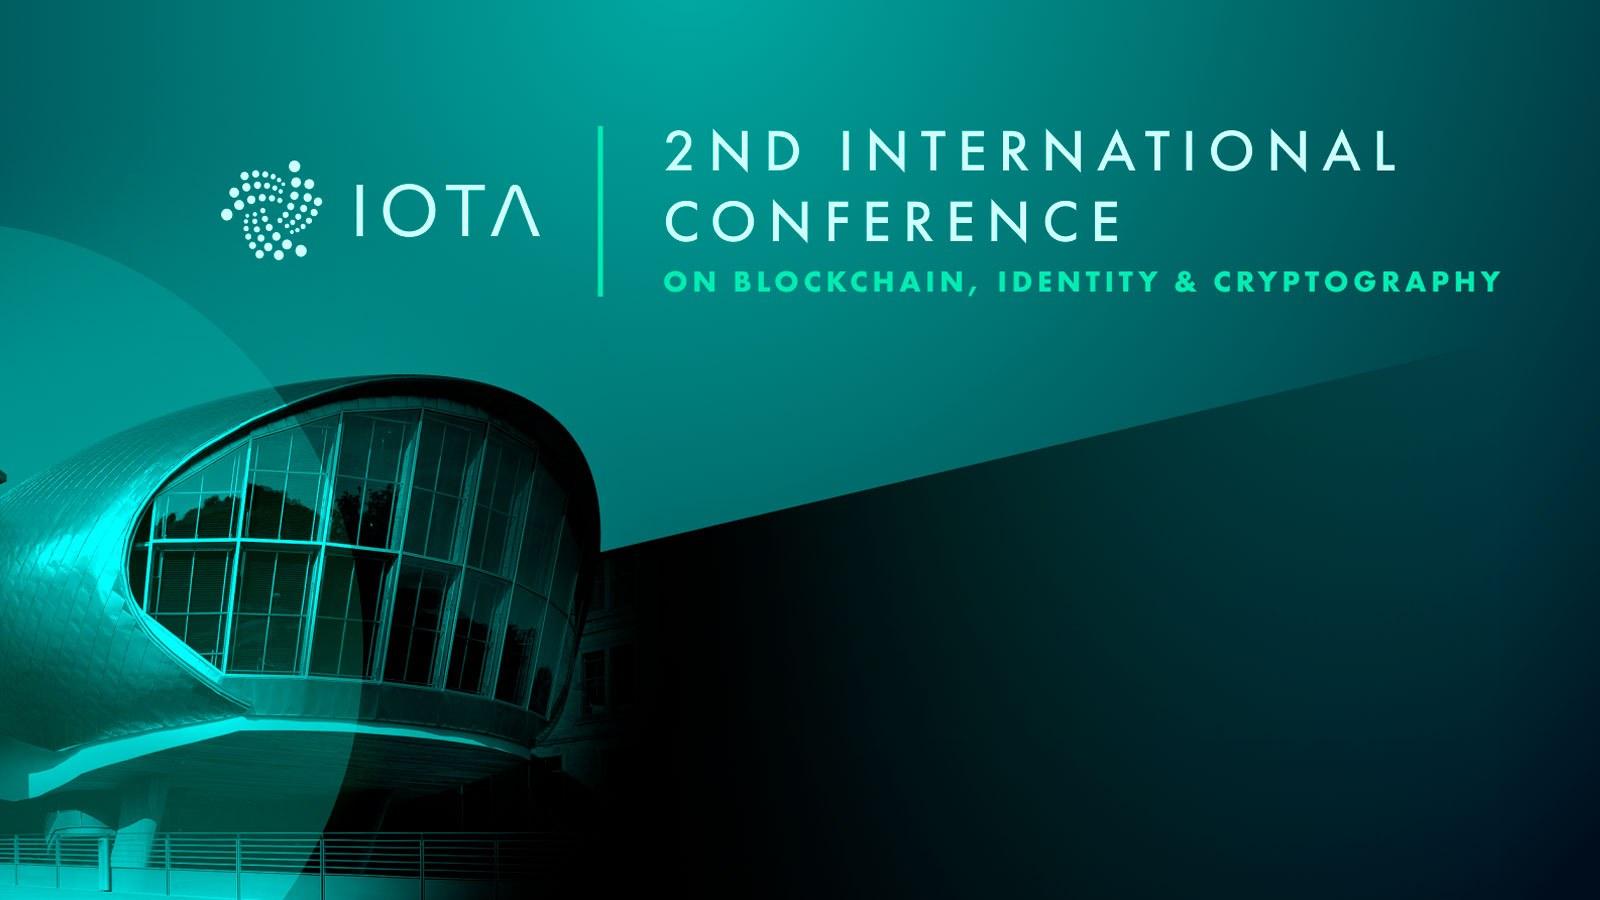 International-Conference-on-Blockchain